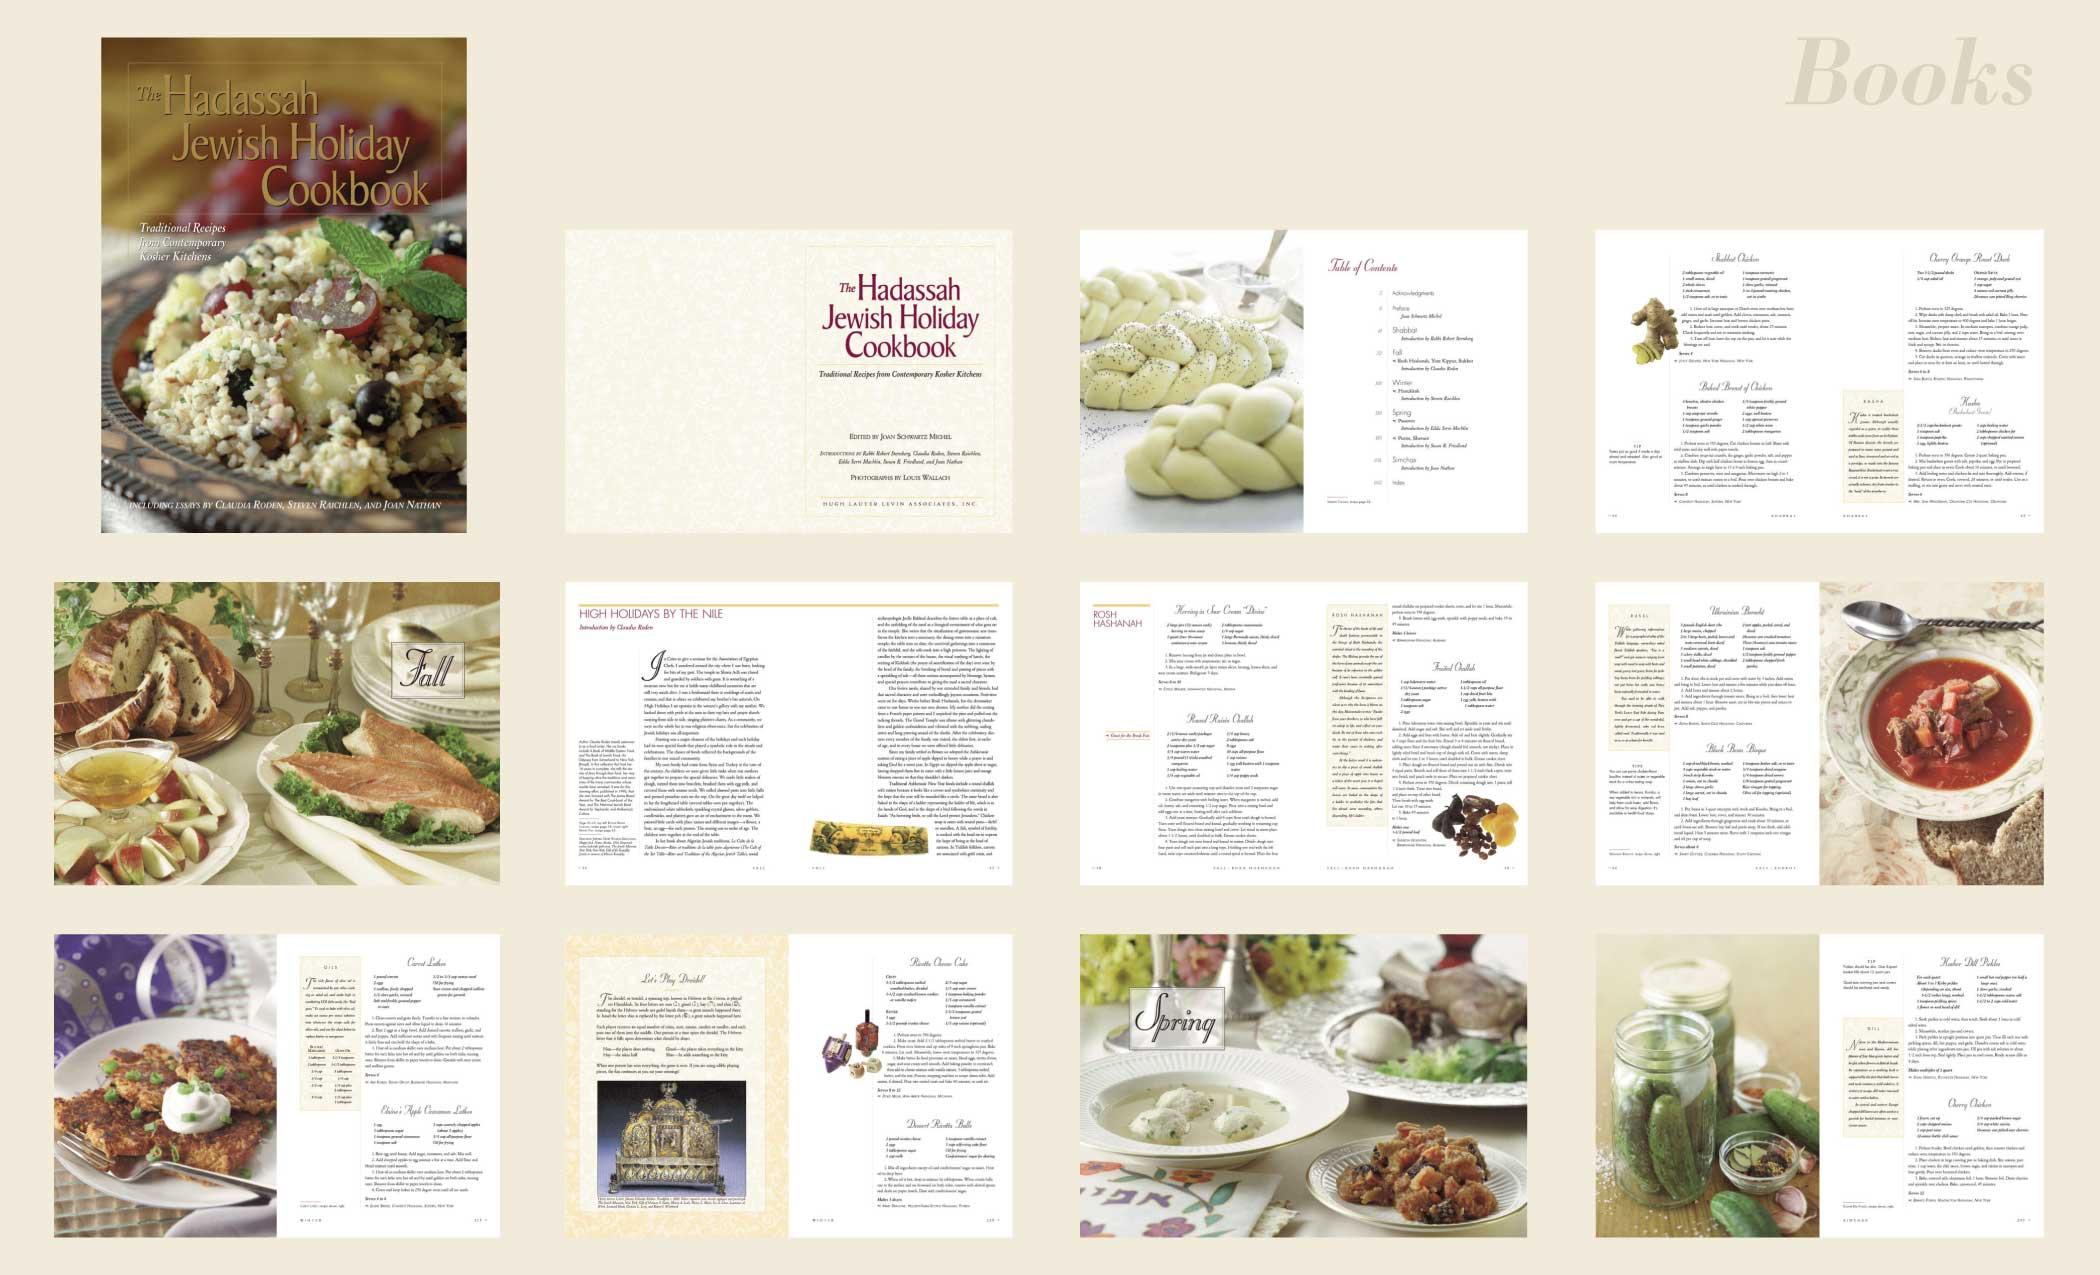 Image Of Interior Design Master Class Book